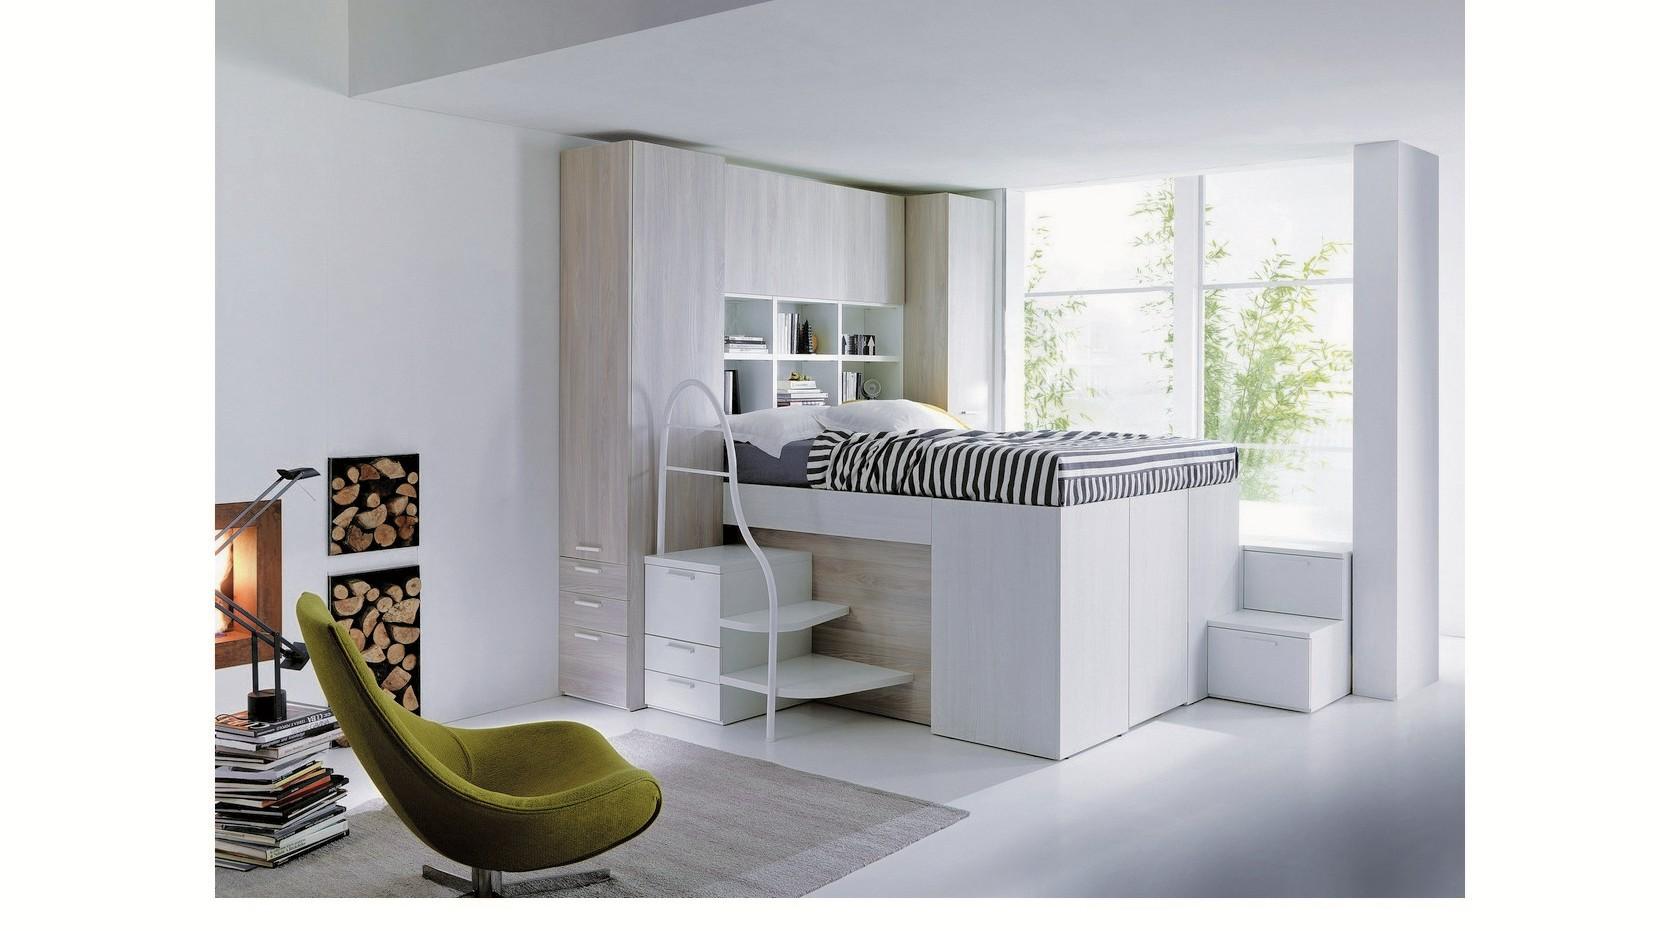 Hide A Closet Platform Bed Tops Spacious Storage Compartment Designs Ideas On Dornob